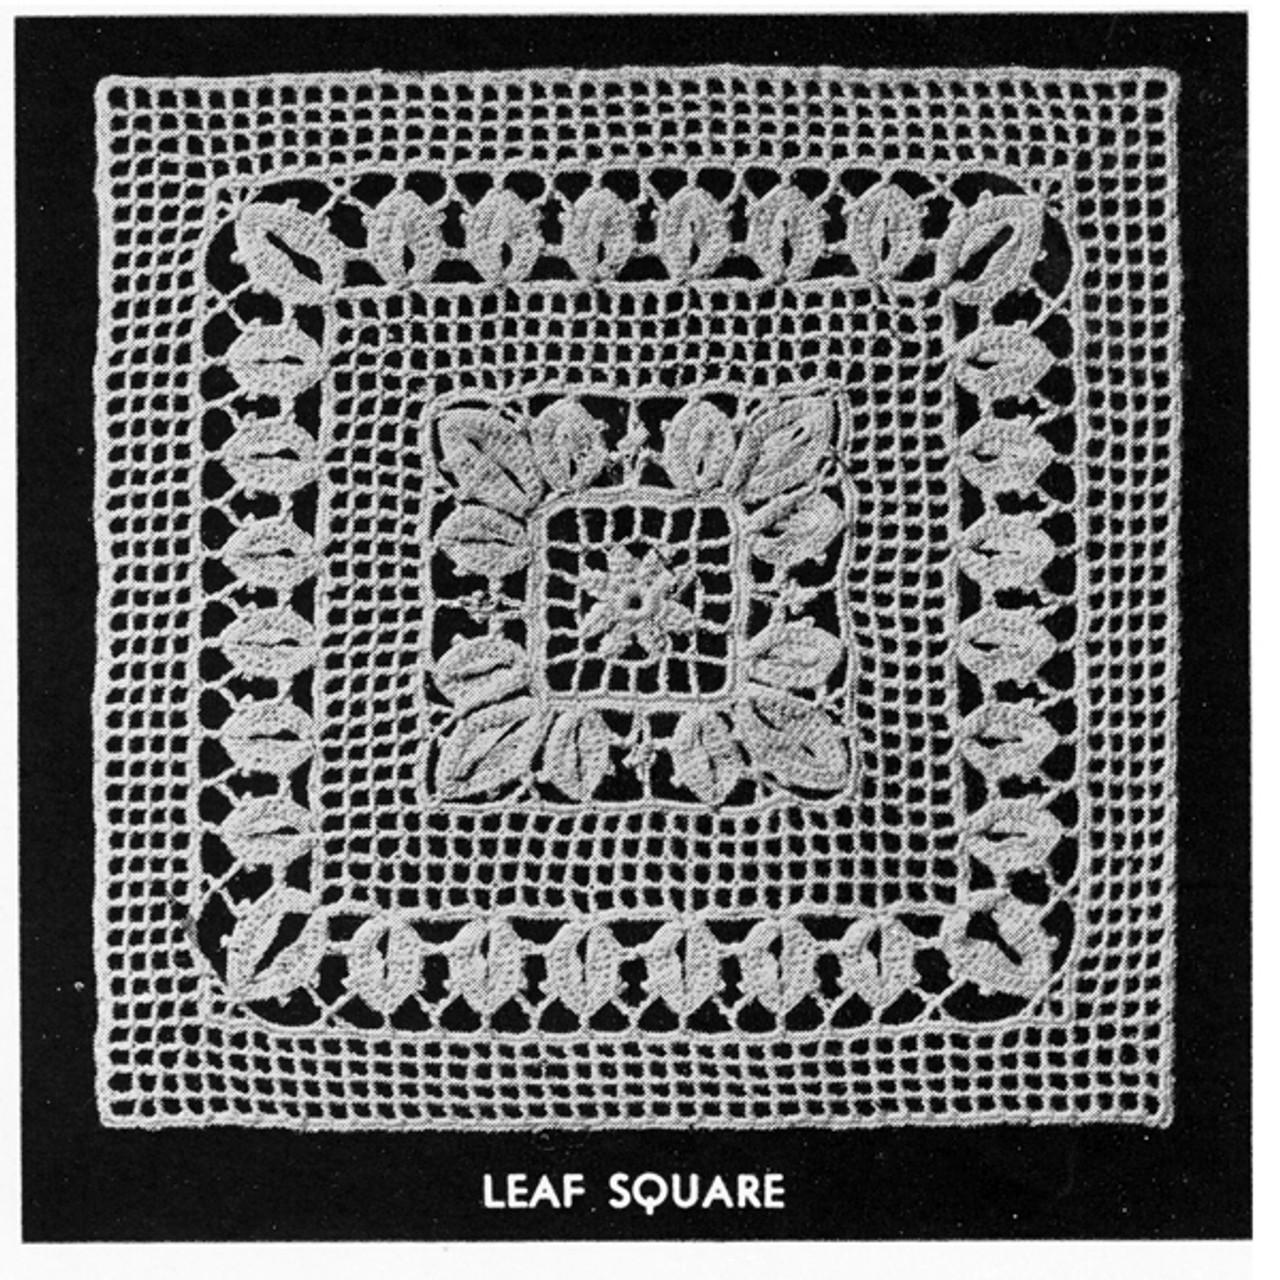 Filet Crochet Square Block for Tablecloth